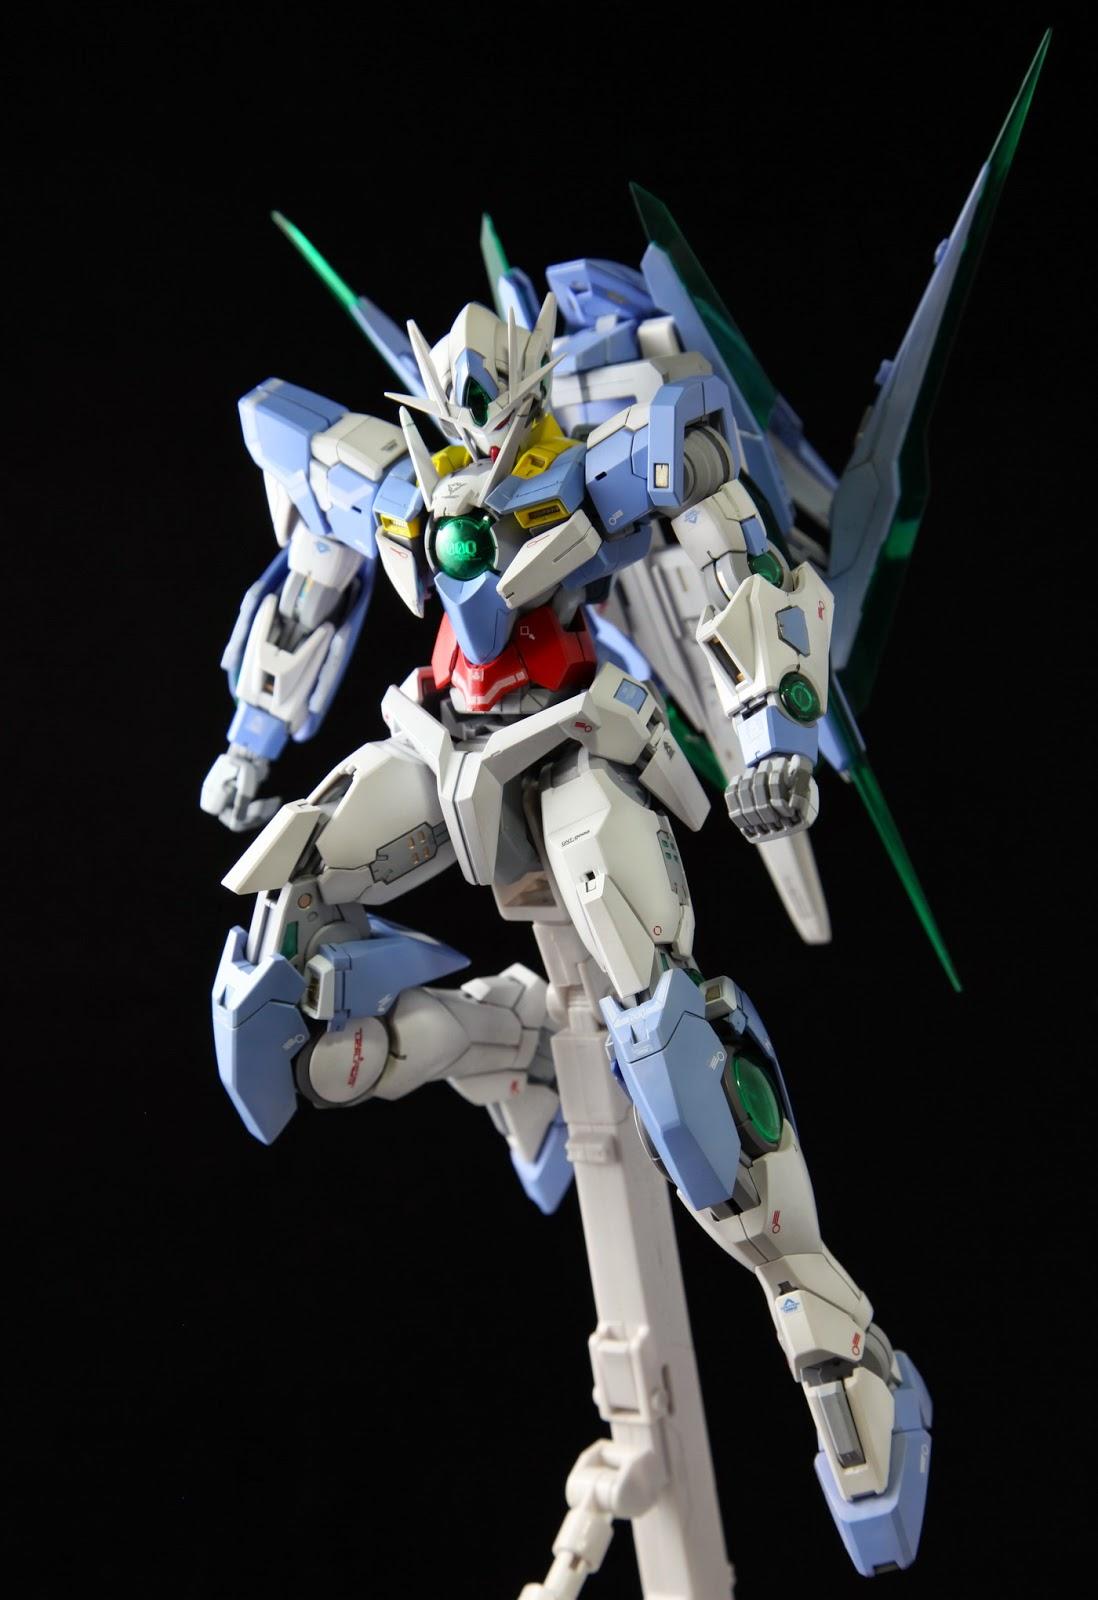 Custom Build Mg 1 100 00 Quanta Gundam Kits Collection